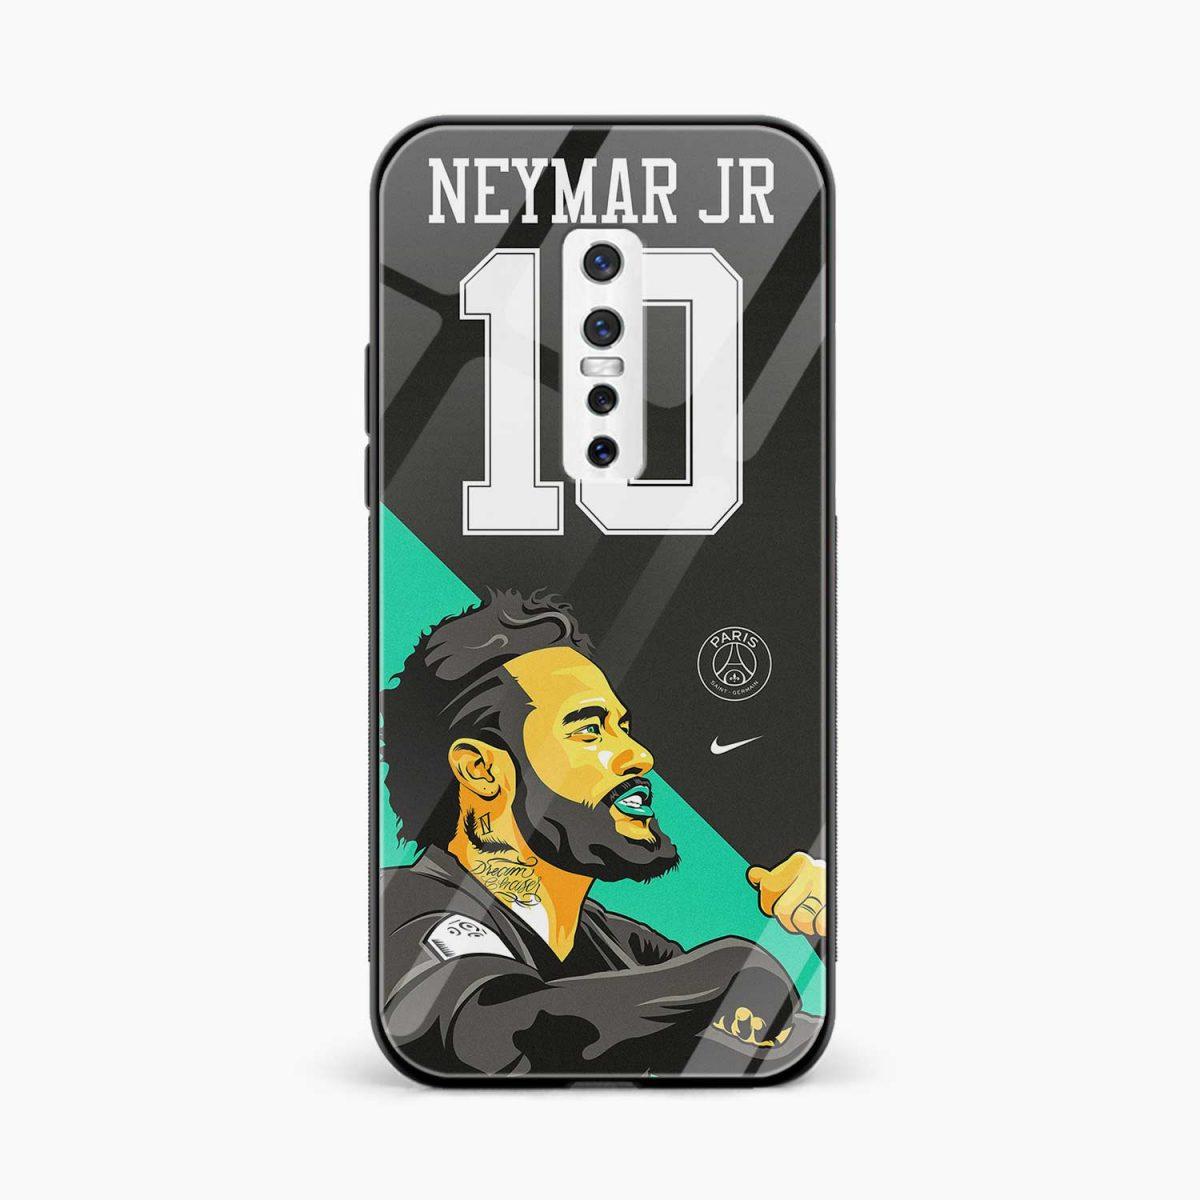 neymar jr 10 front view vivo v17 plug back cover